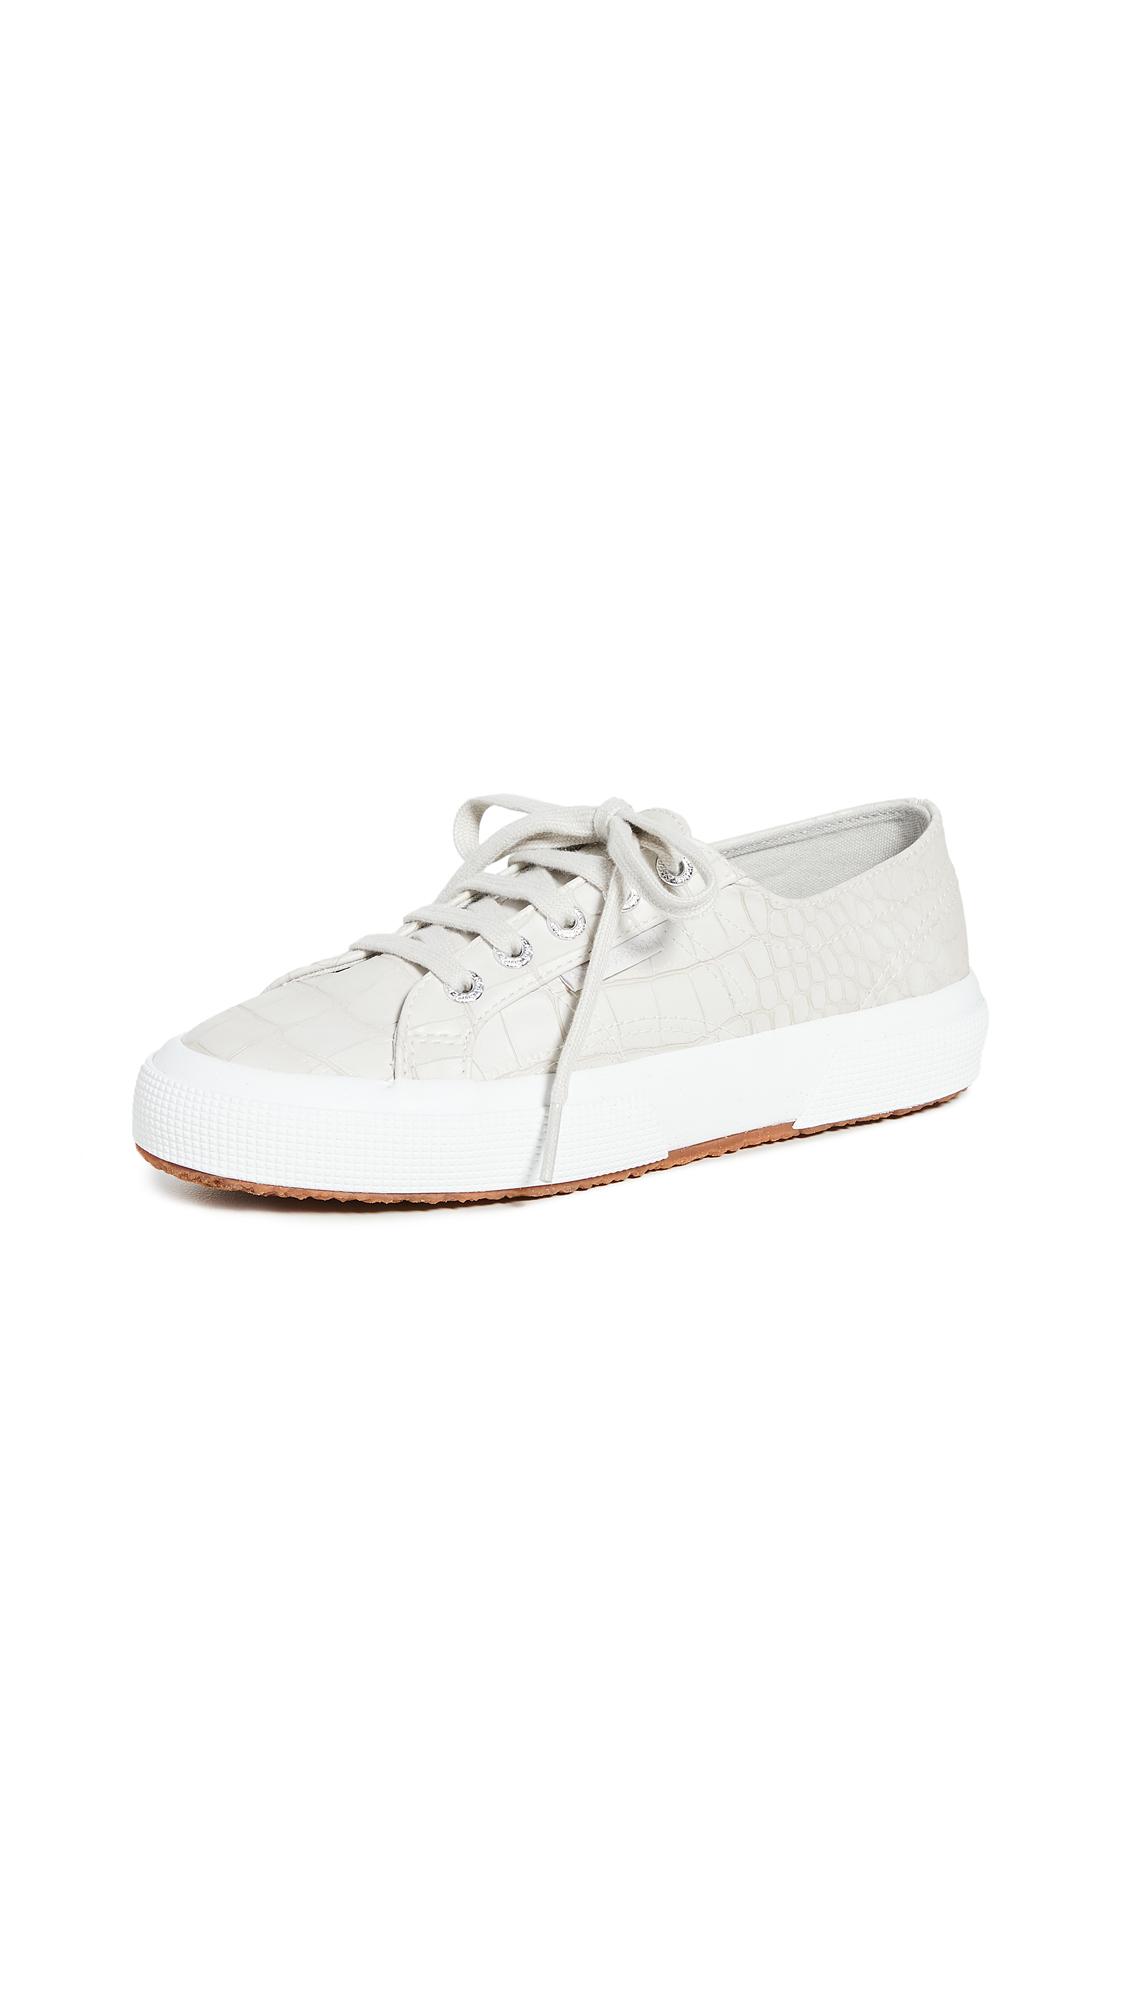 Superga 2750 Croc W Sneakers - 25% Off Sale